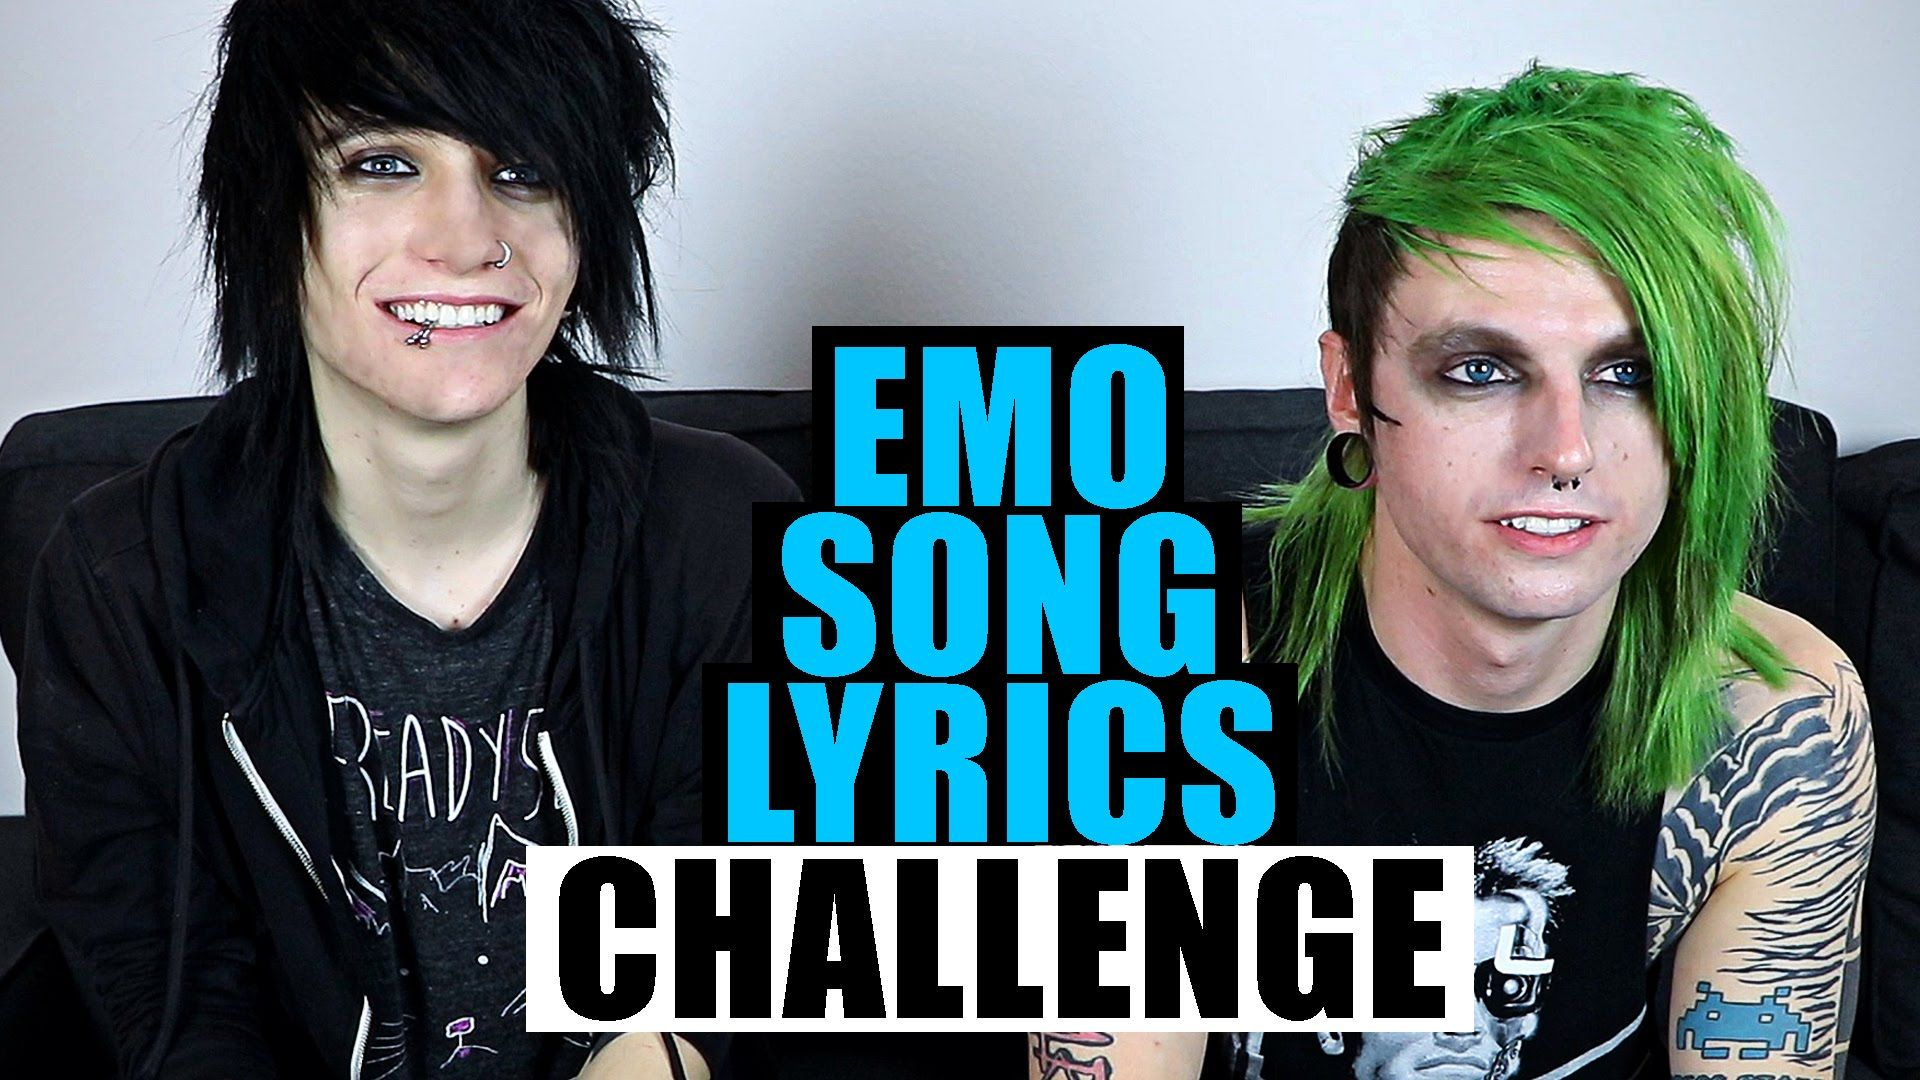 Emo song lyrics challenge feat johnnie guilbert my digital escape